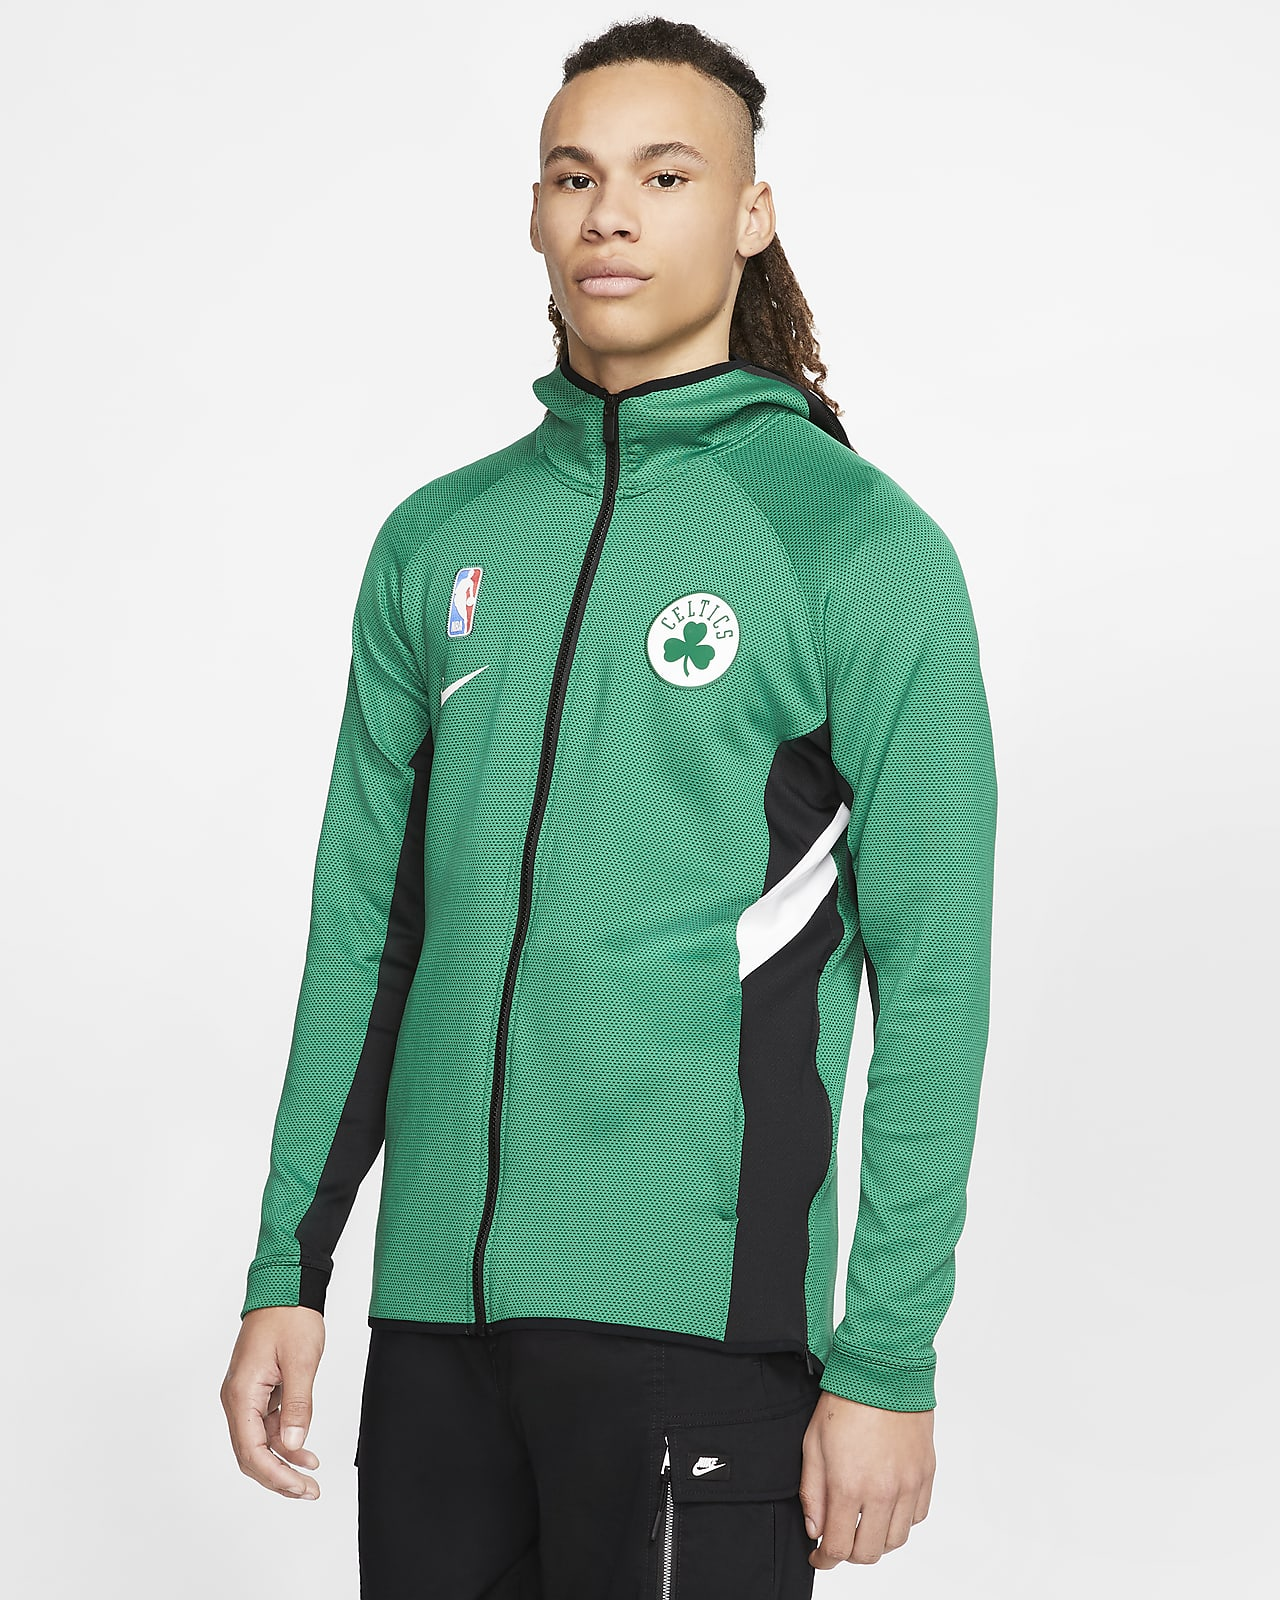 católico clon tirano  Boston Celtics Showtime Men's Nike Therma Flex NBA Hoodie. Nike GB